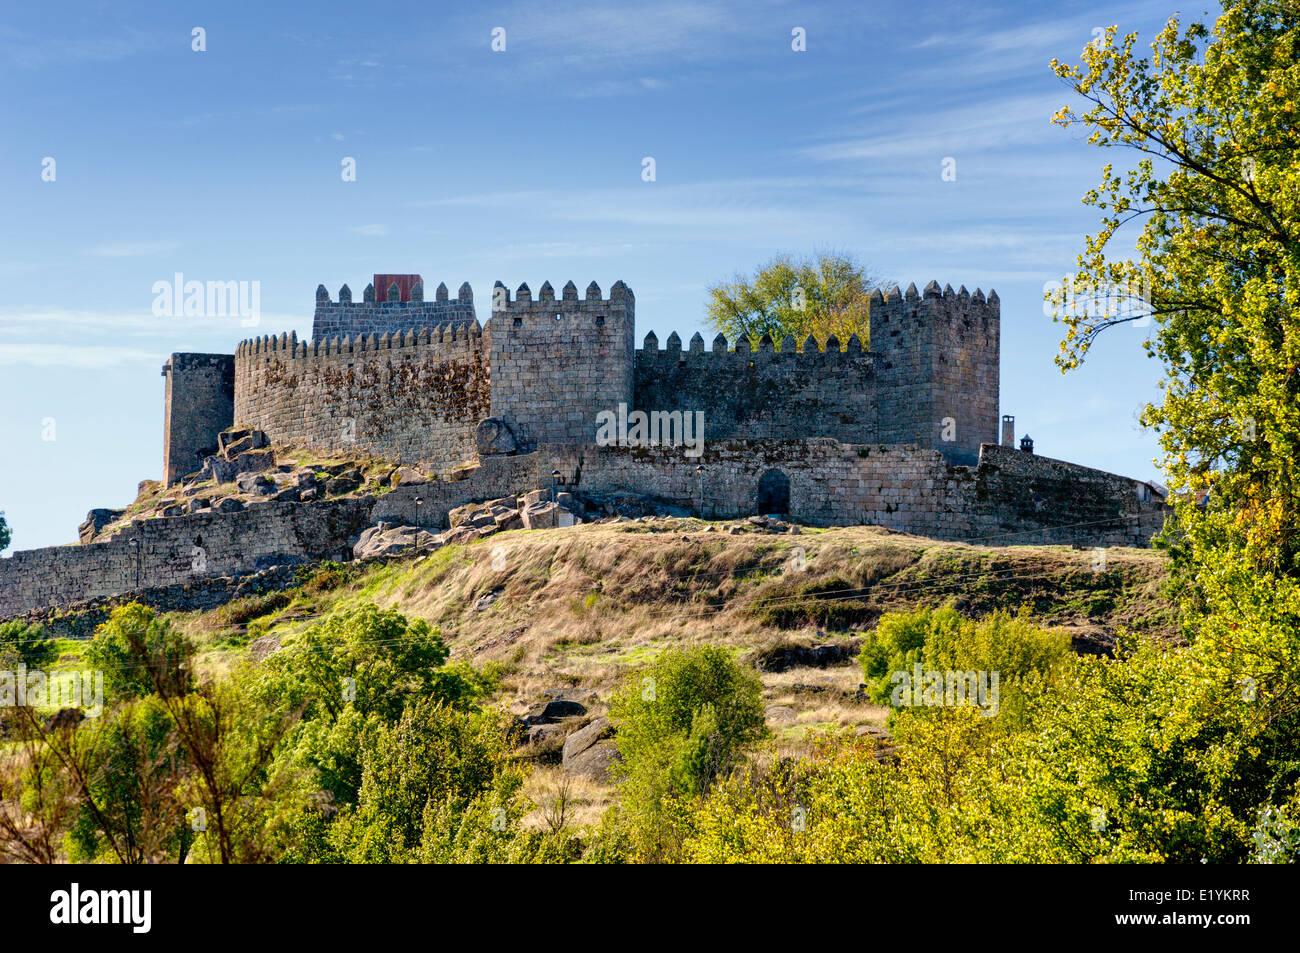 Portugal, the Beira Alta, Trancoso castle Stock Photo, Royalty Free Image 70064395 Alamy